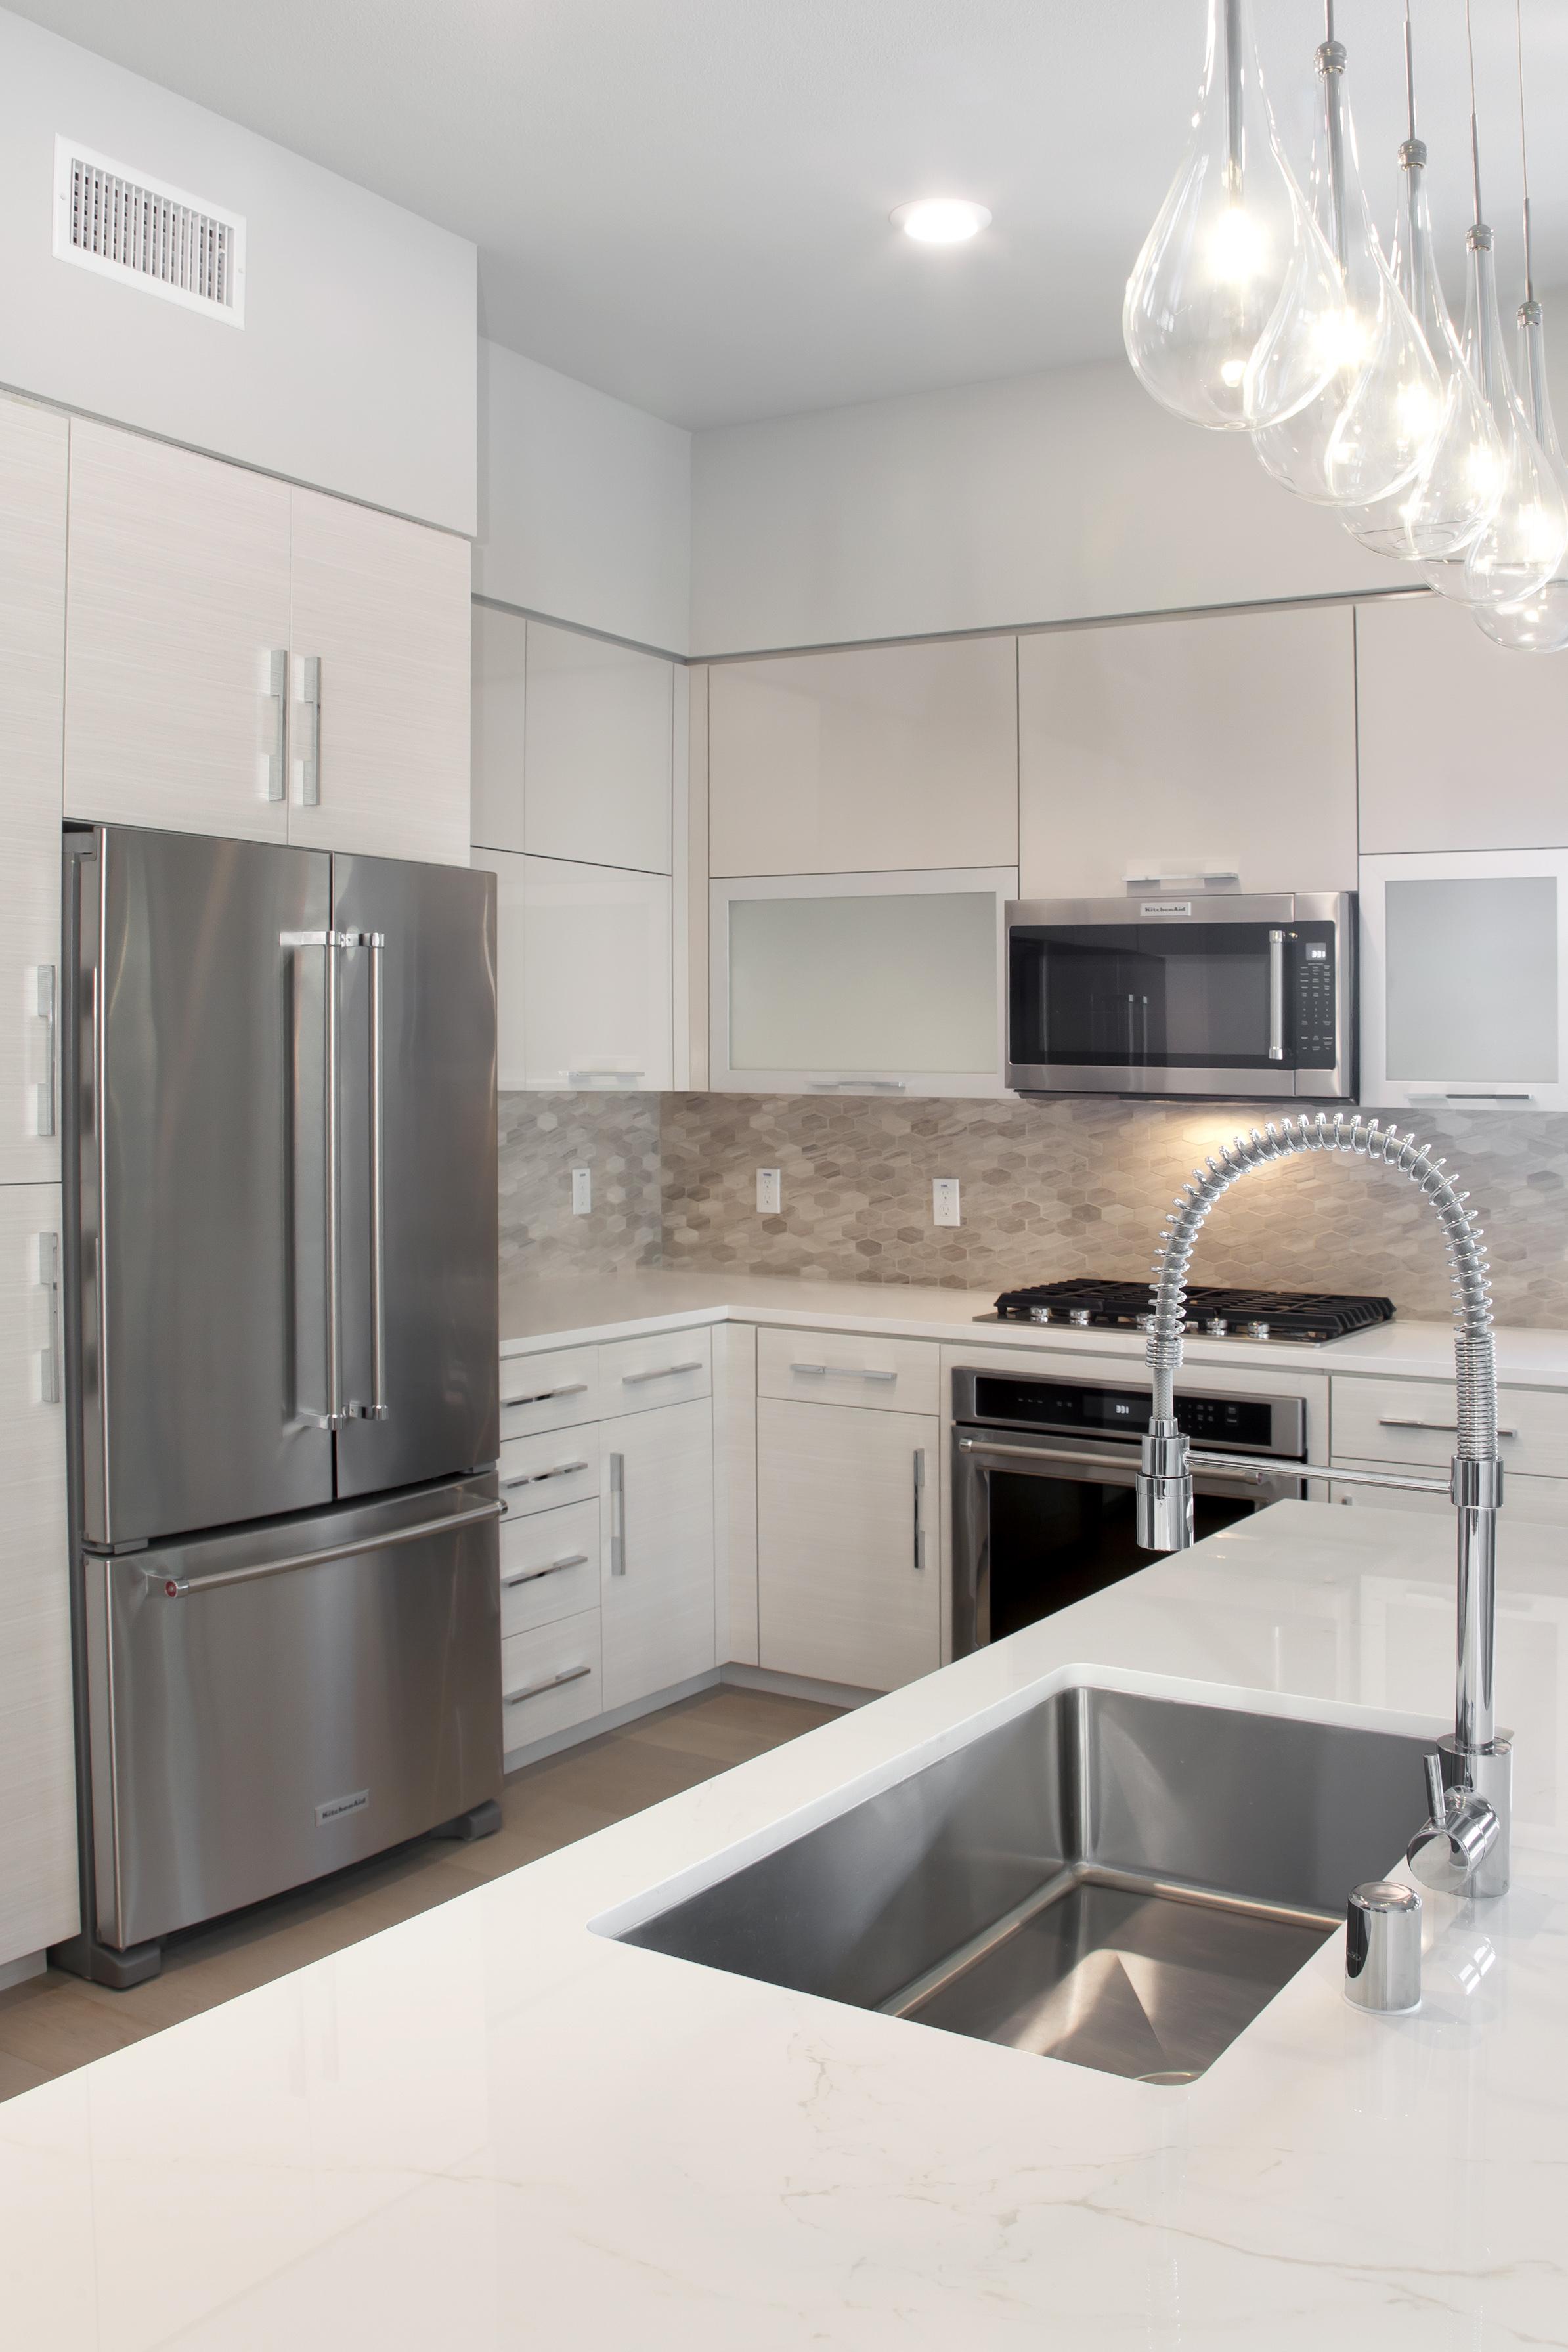 Blu Harbor Apartments, Redwood City Apartments, New Apartment